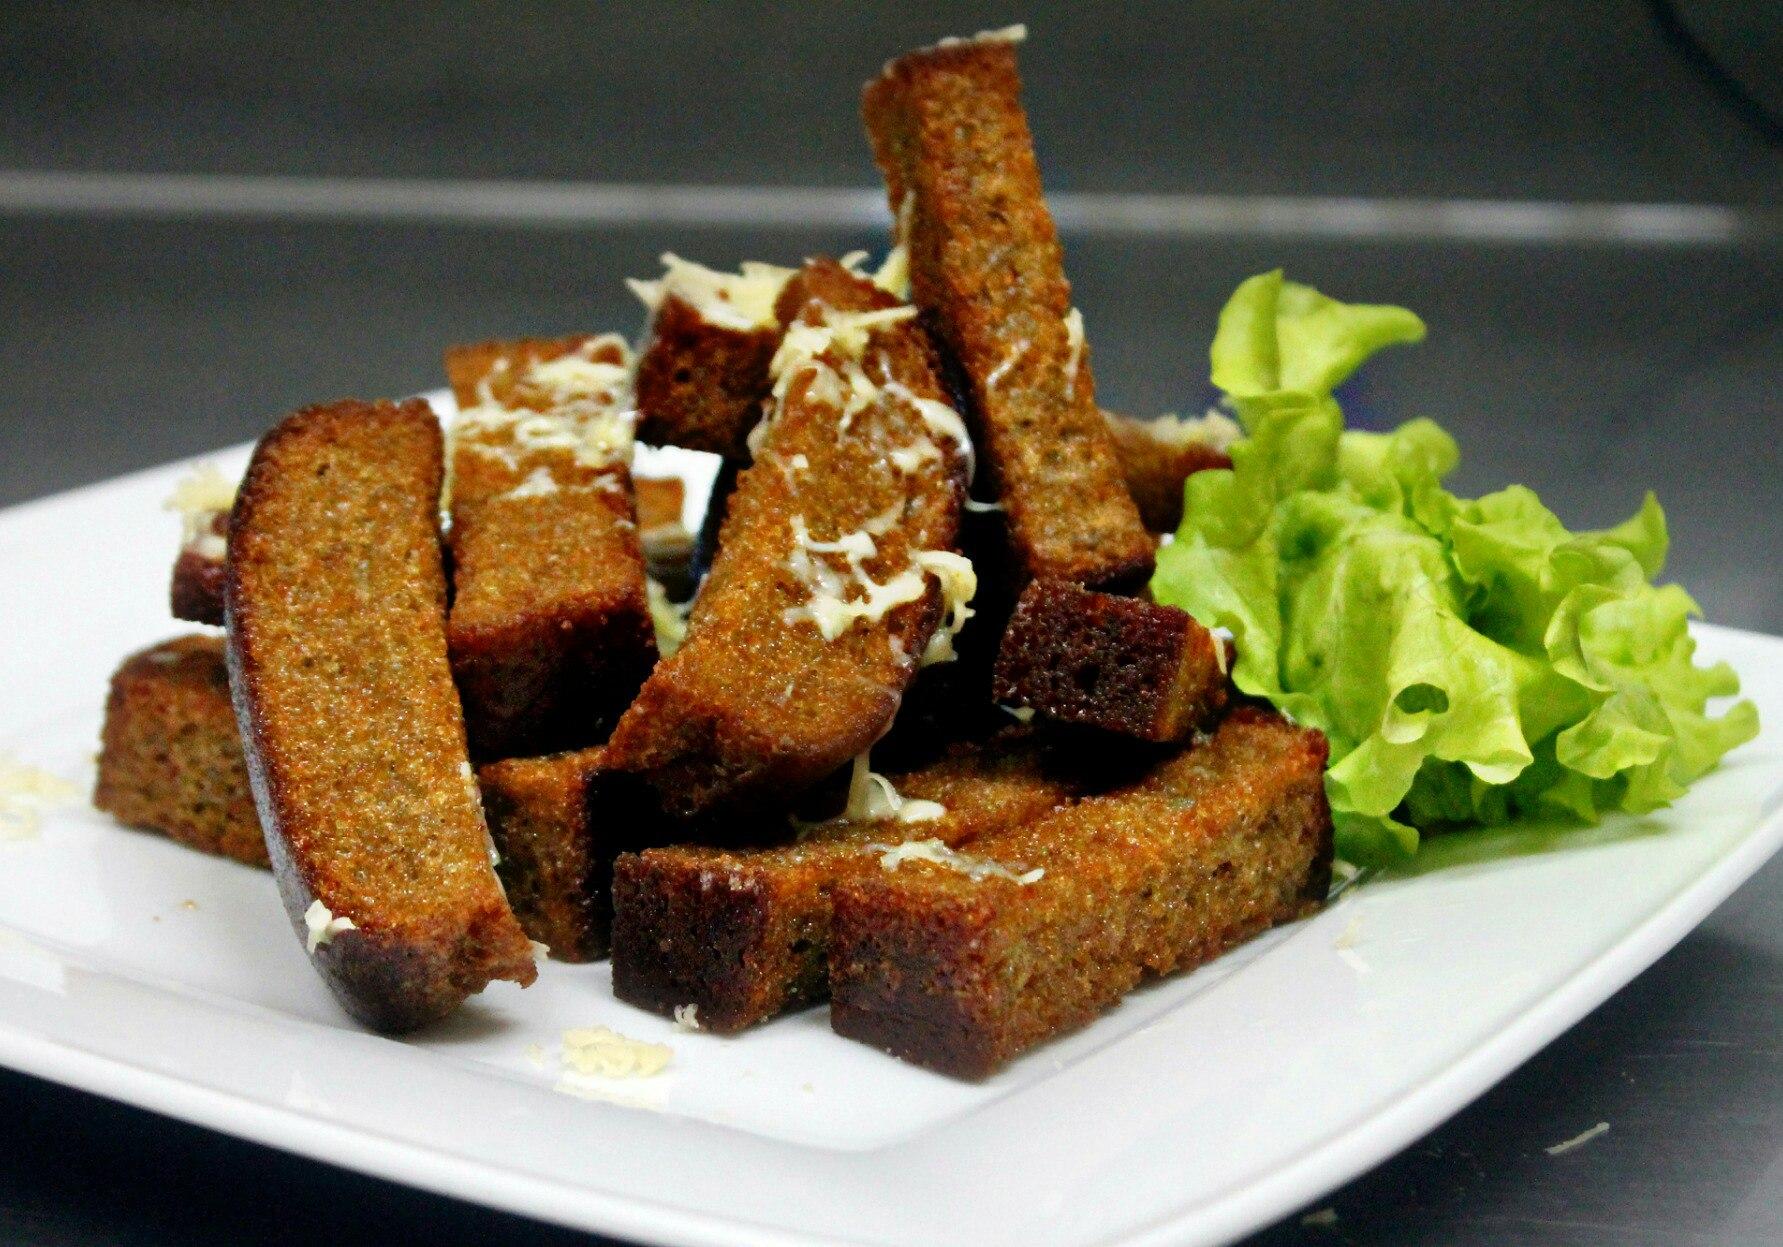 Cухарики с чесноком в микроволновке — вкусно готовим дома